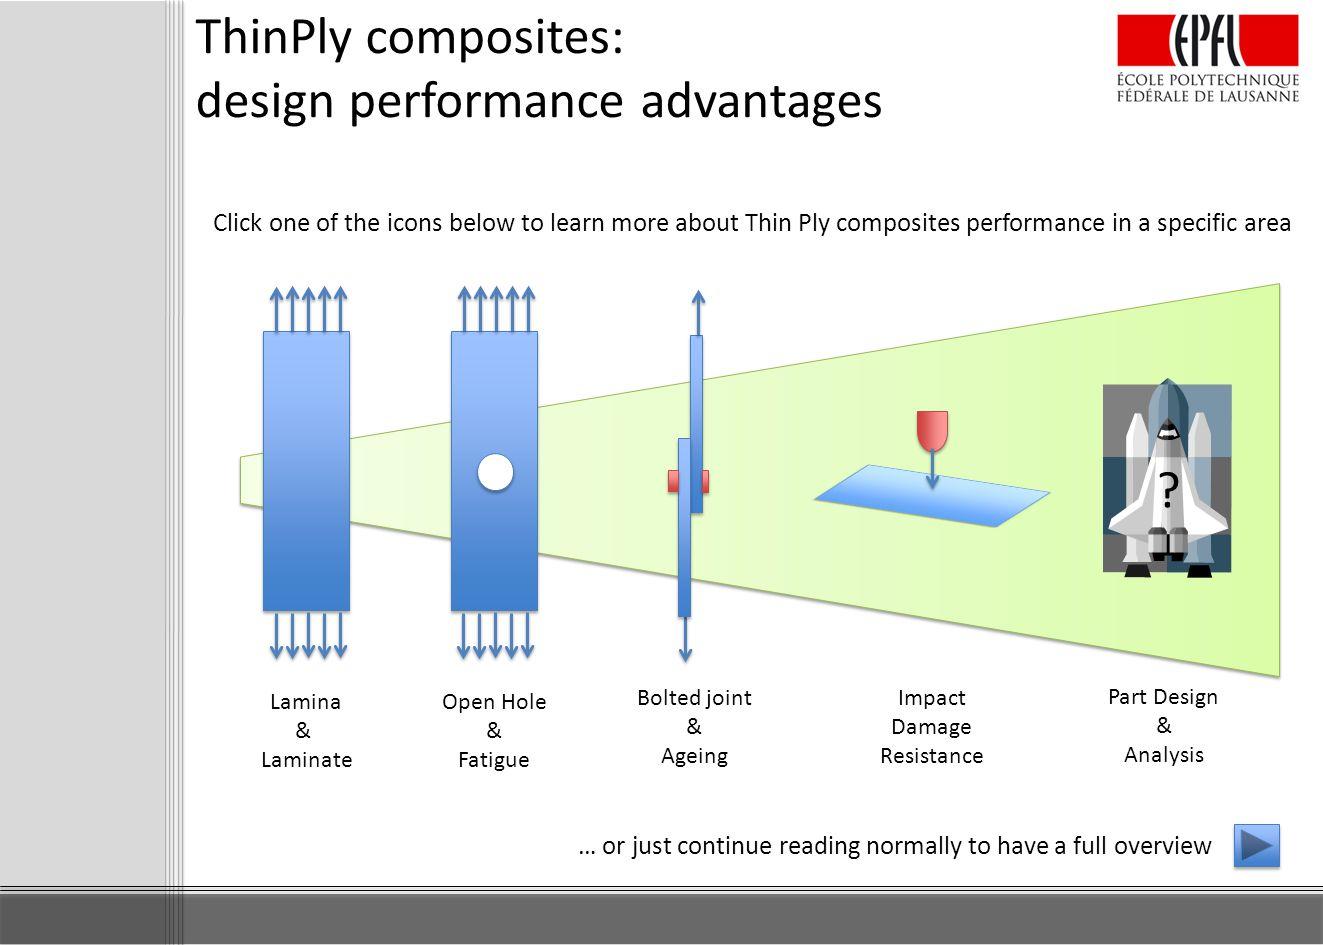 ThinPly composites: design performance advantages